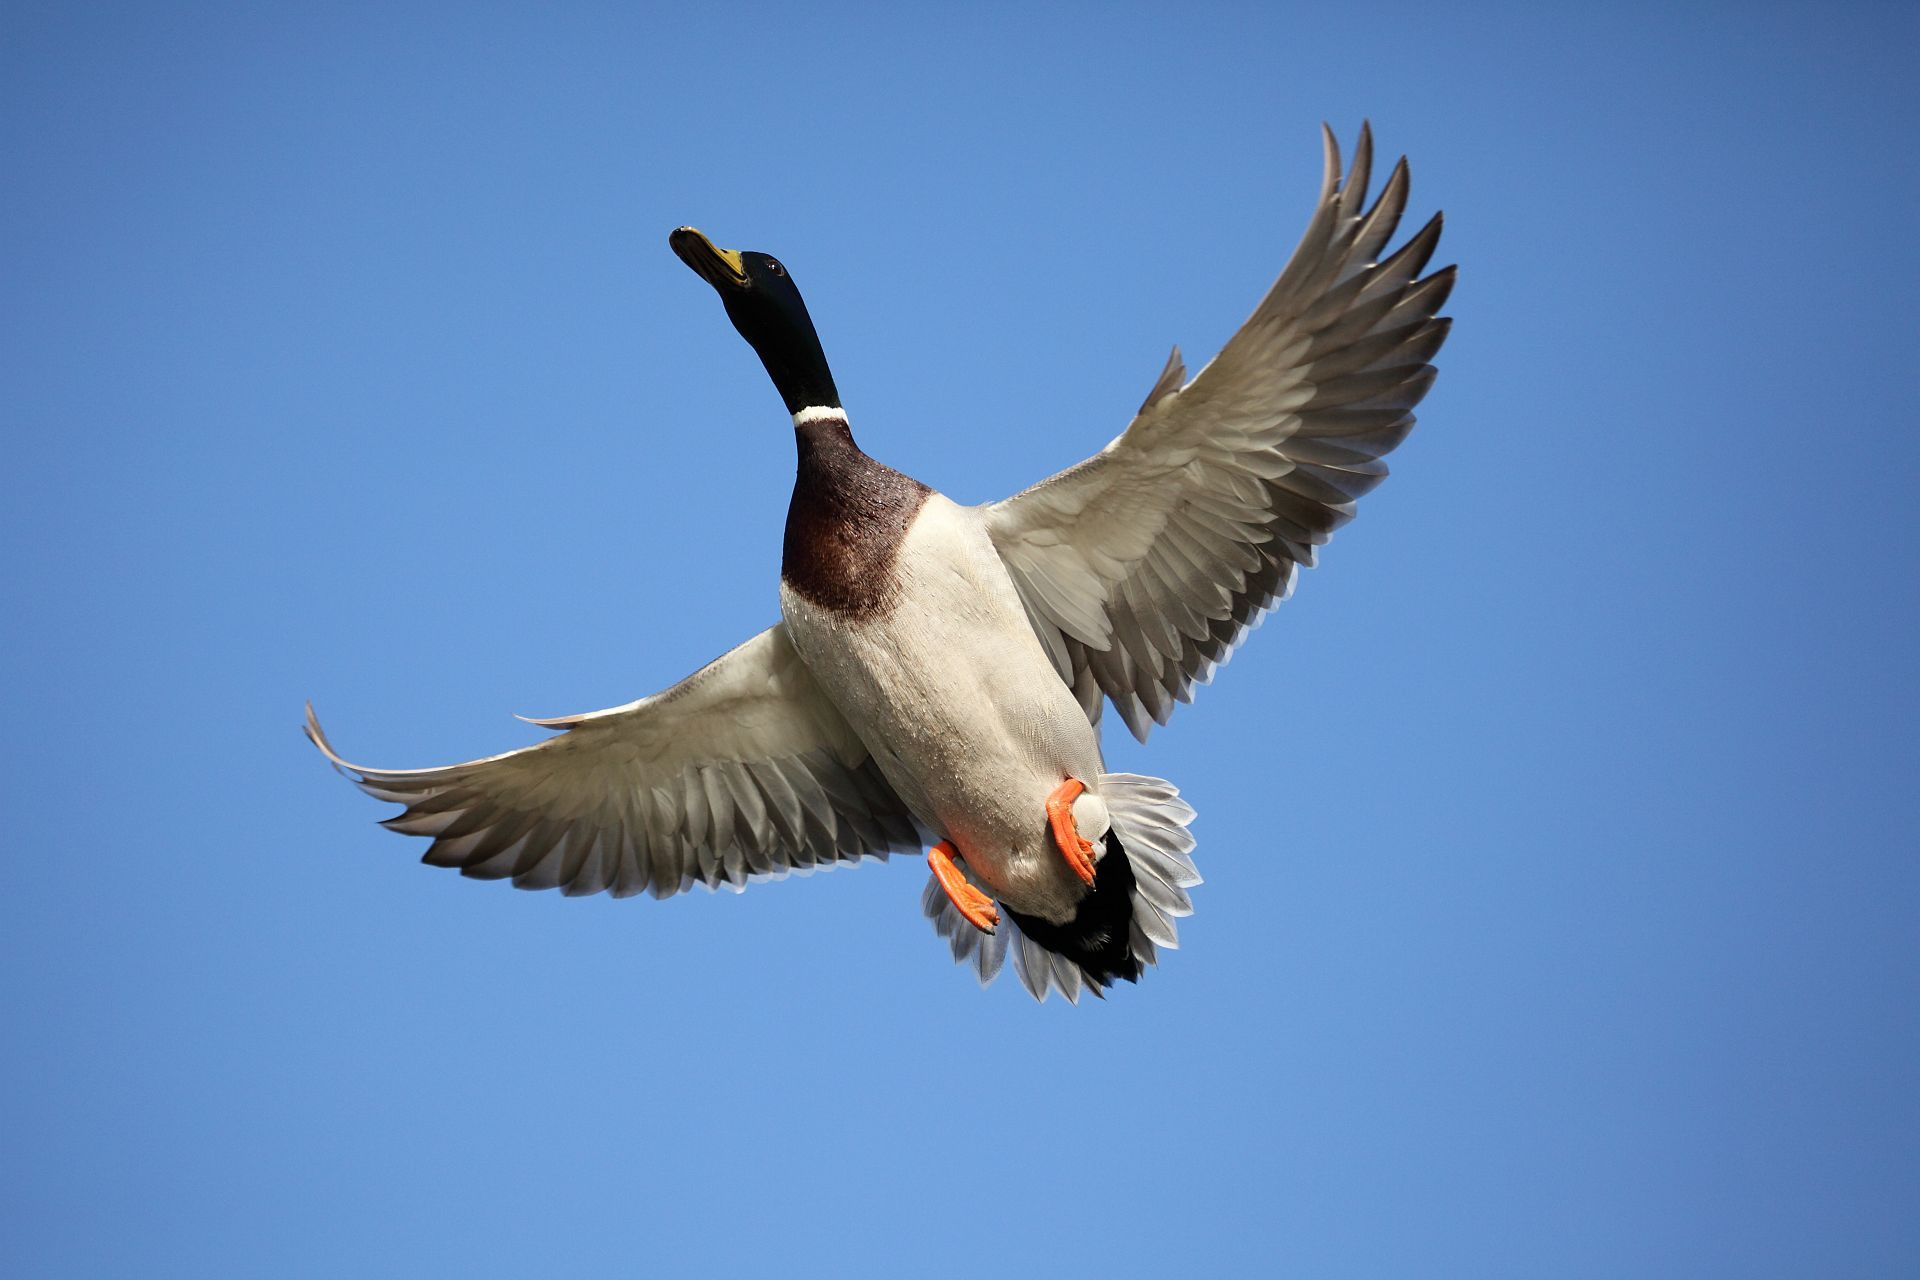 Flying ducks photo